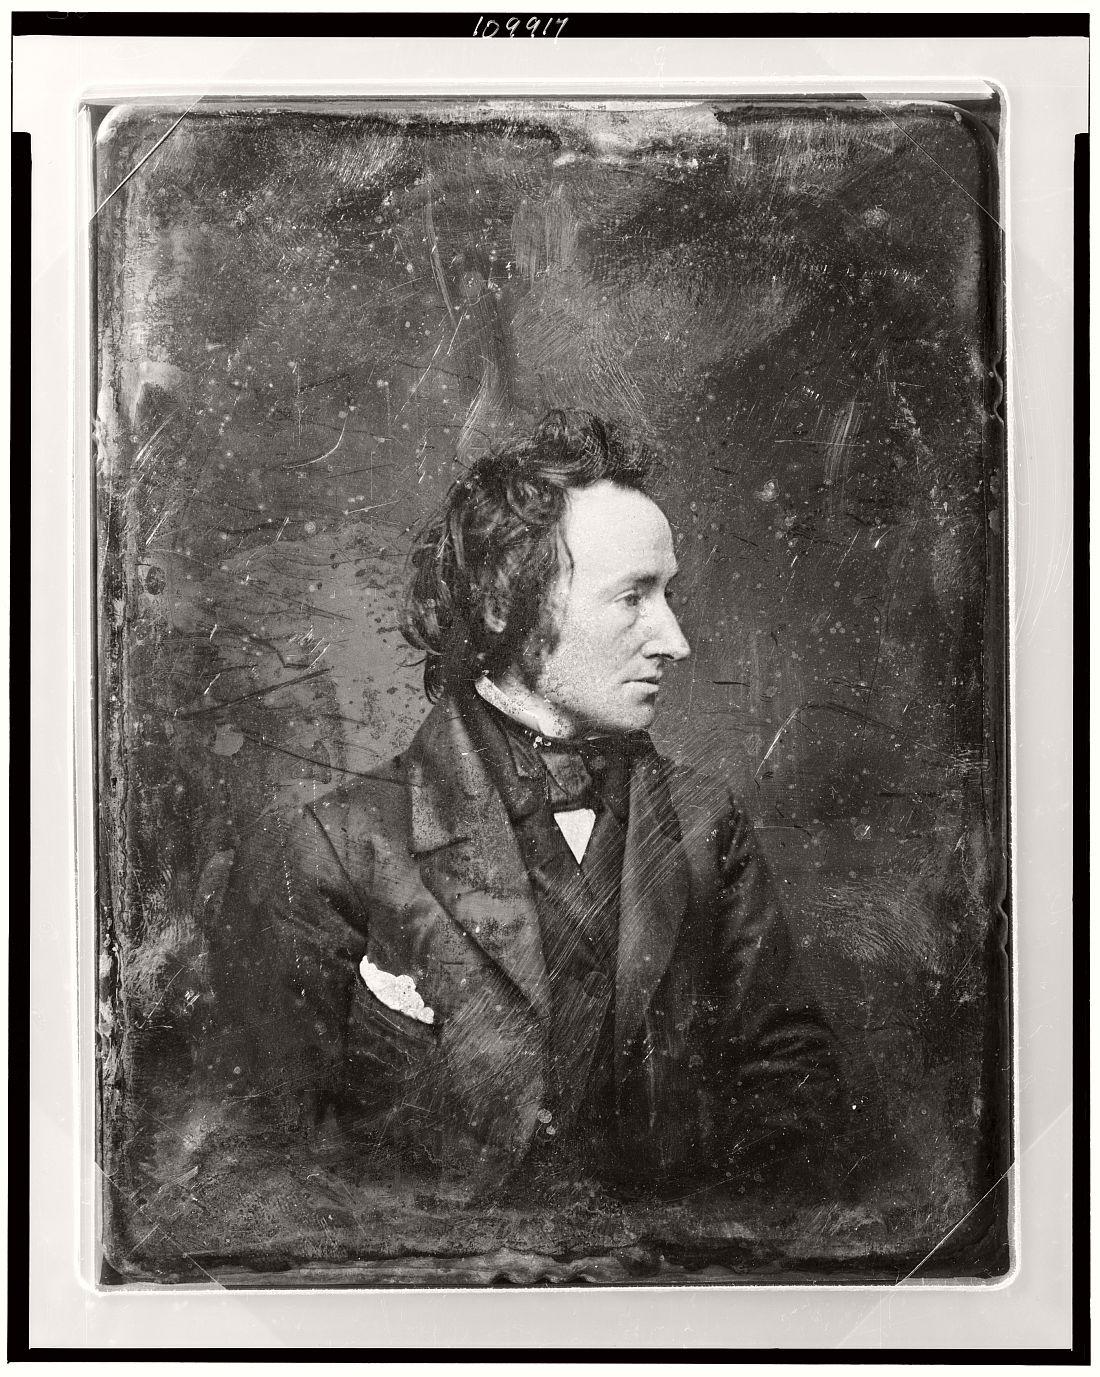 vintage-daguerreotype-portraits-from-xix-century-1844-1860-23